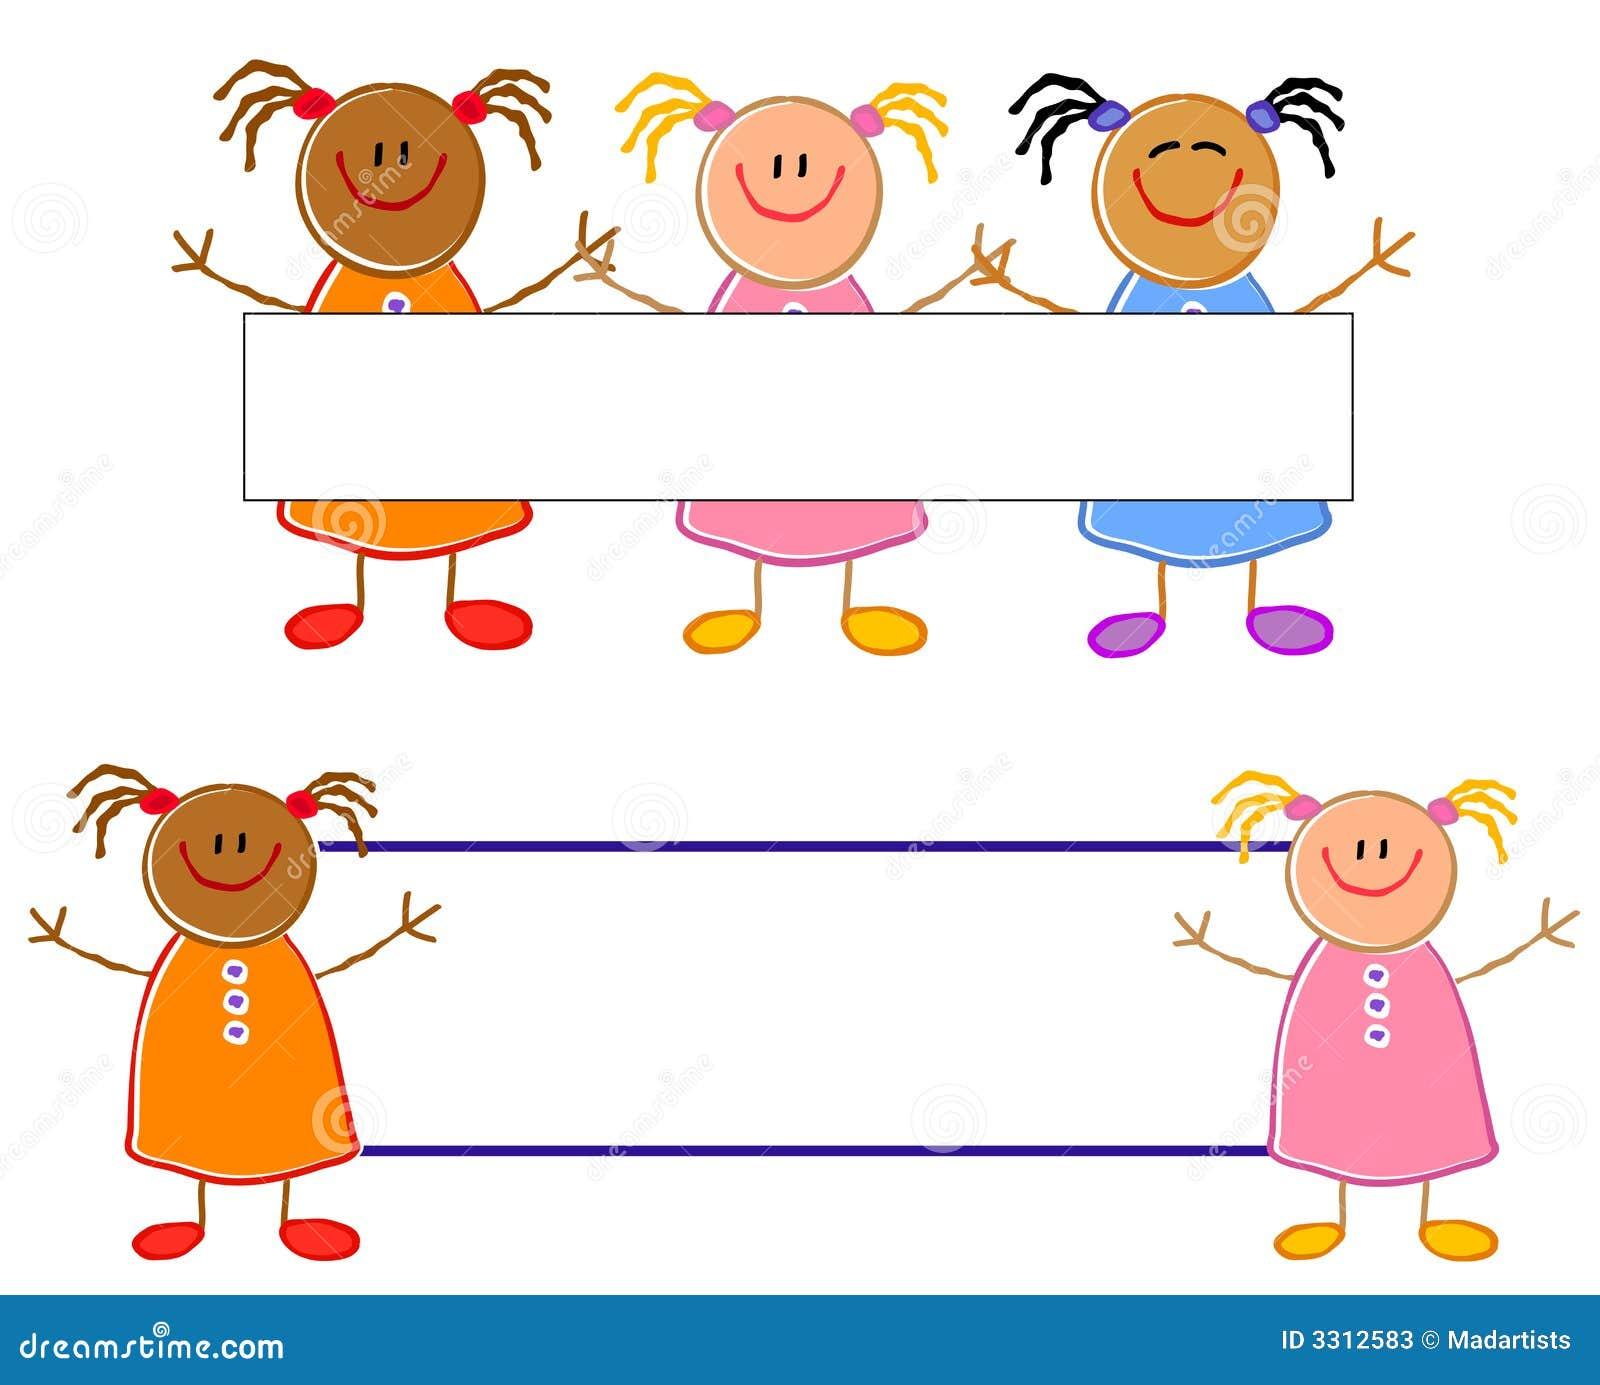 cute child drawing girls logos stock photos image 3312583